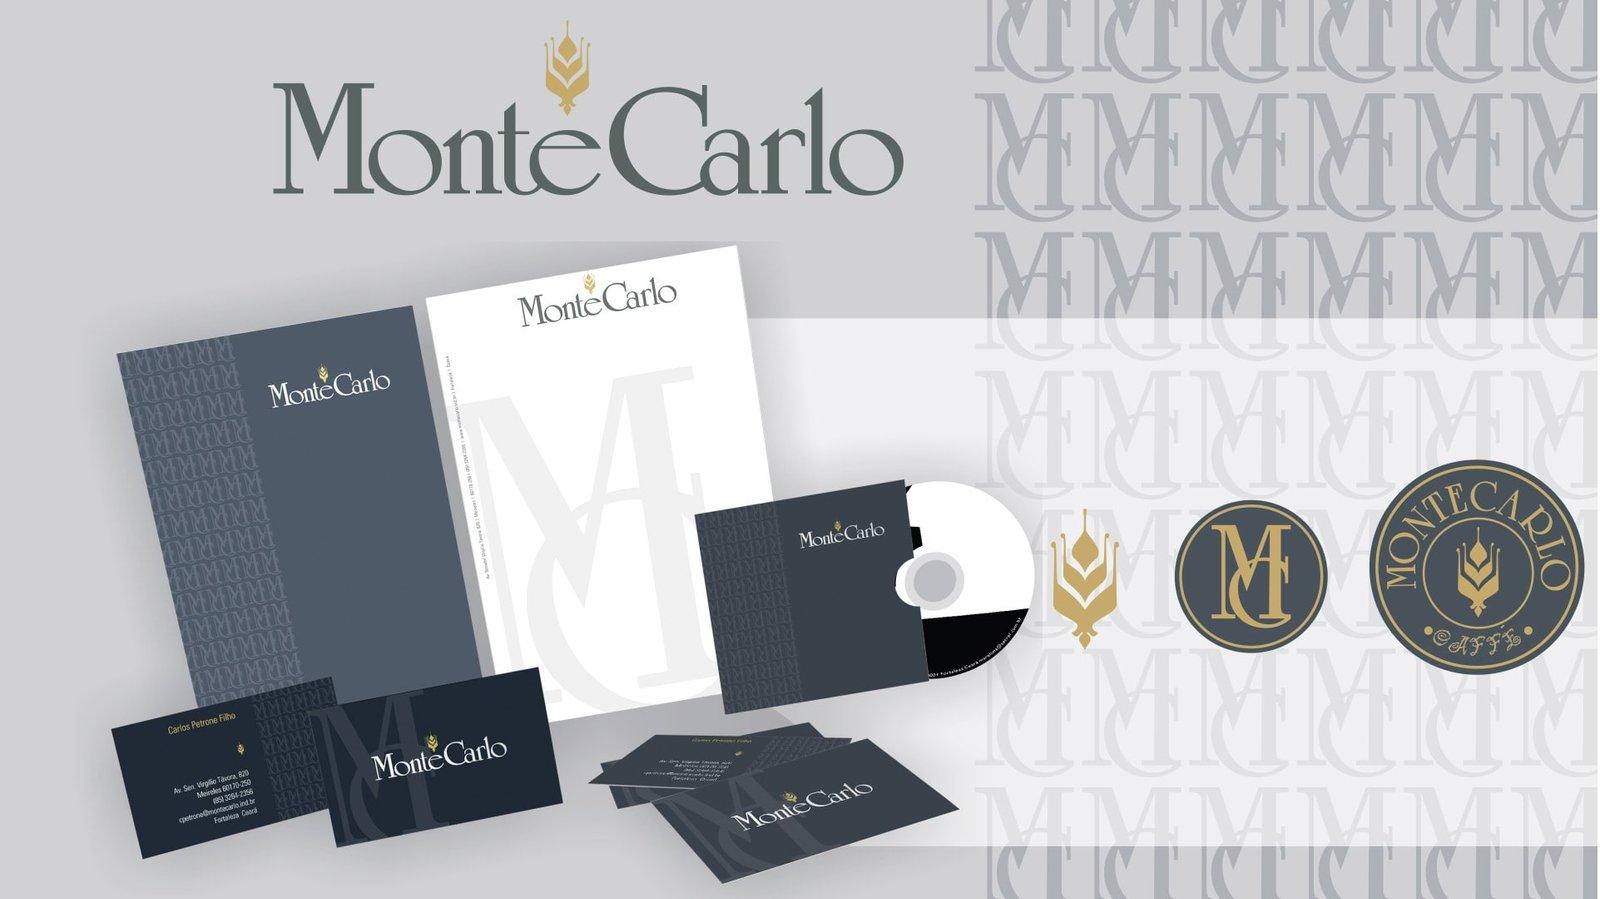 MLMS Marcas Monte Carlo